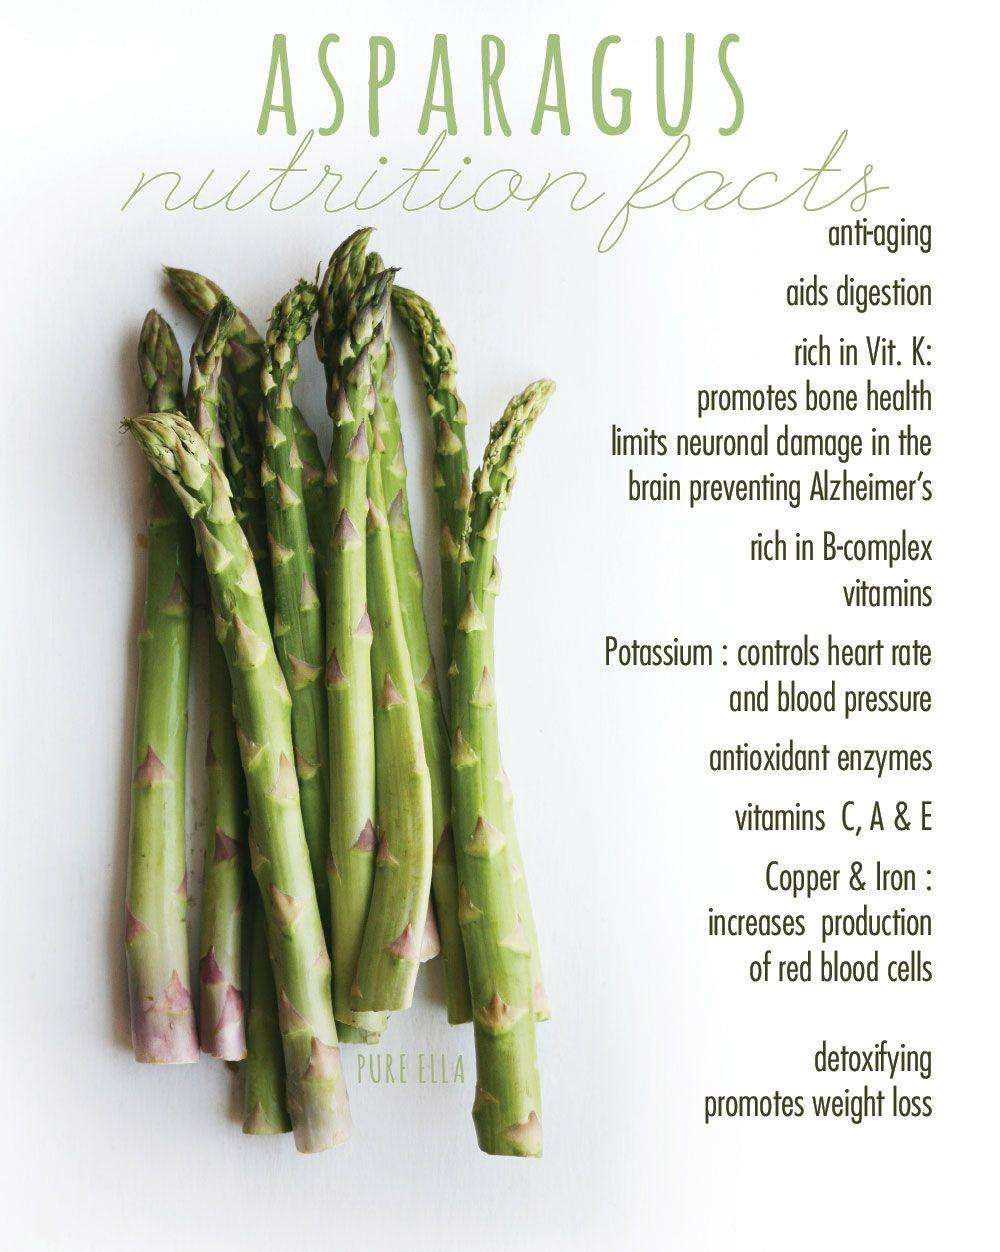 nutrition facts : health benefits of asparagus | asparagus